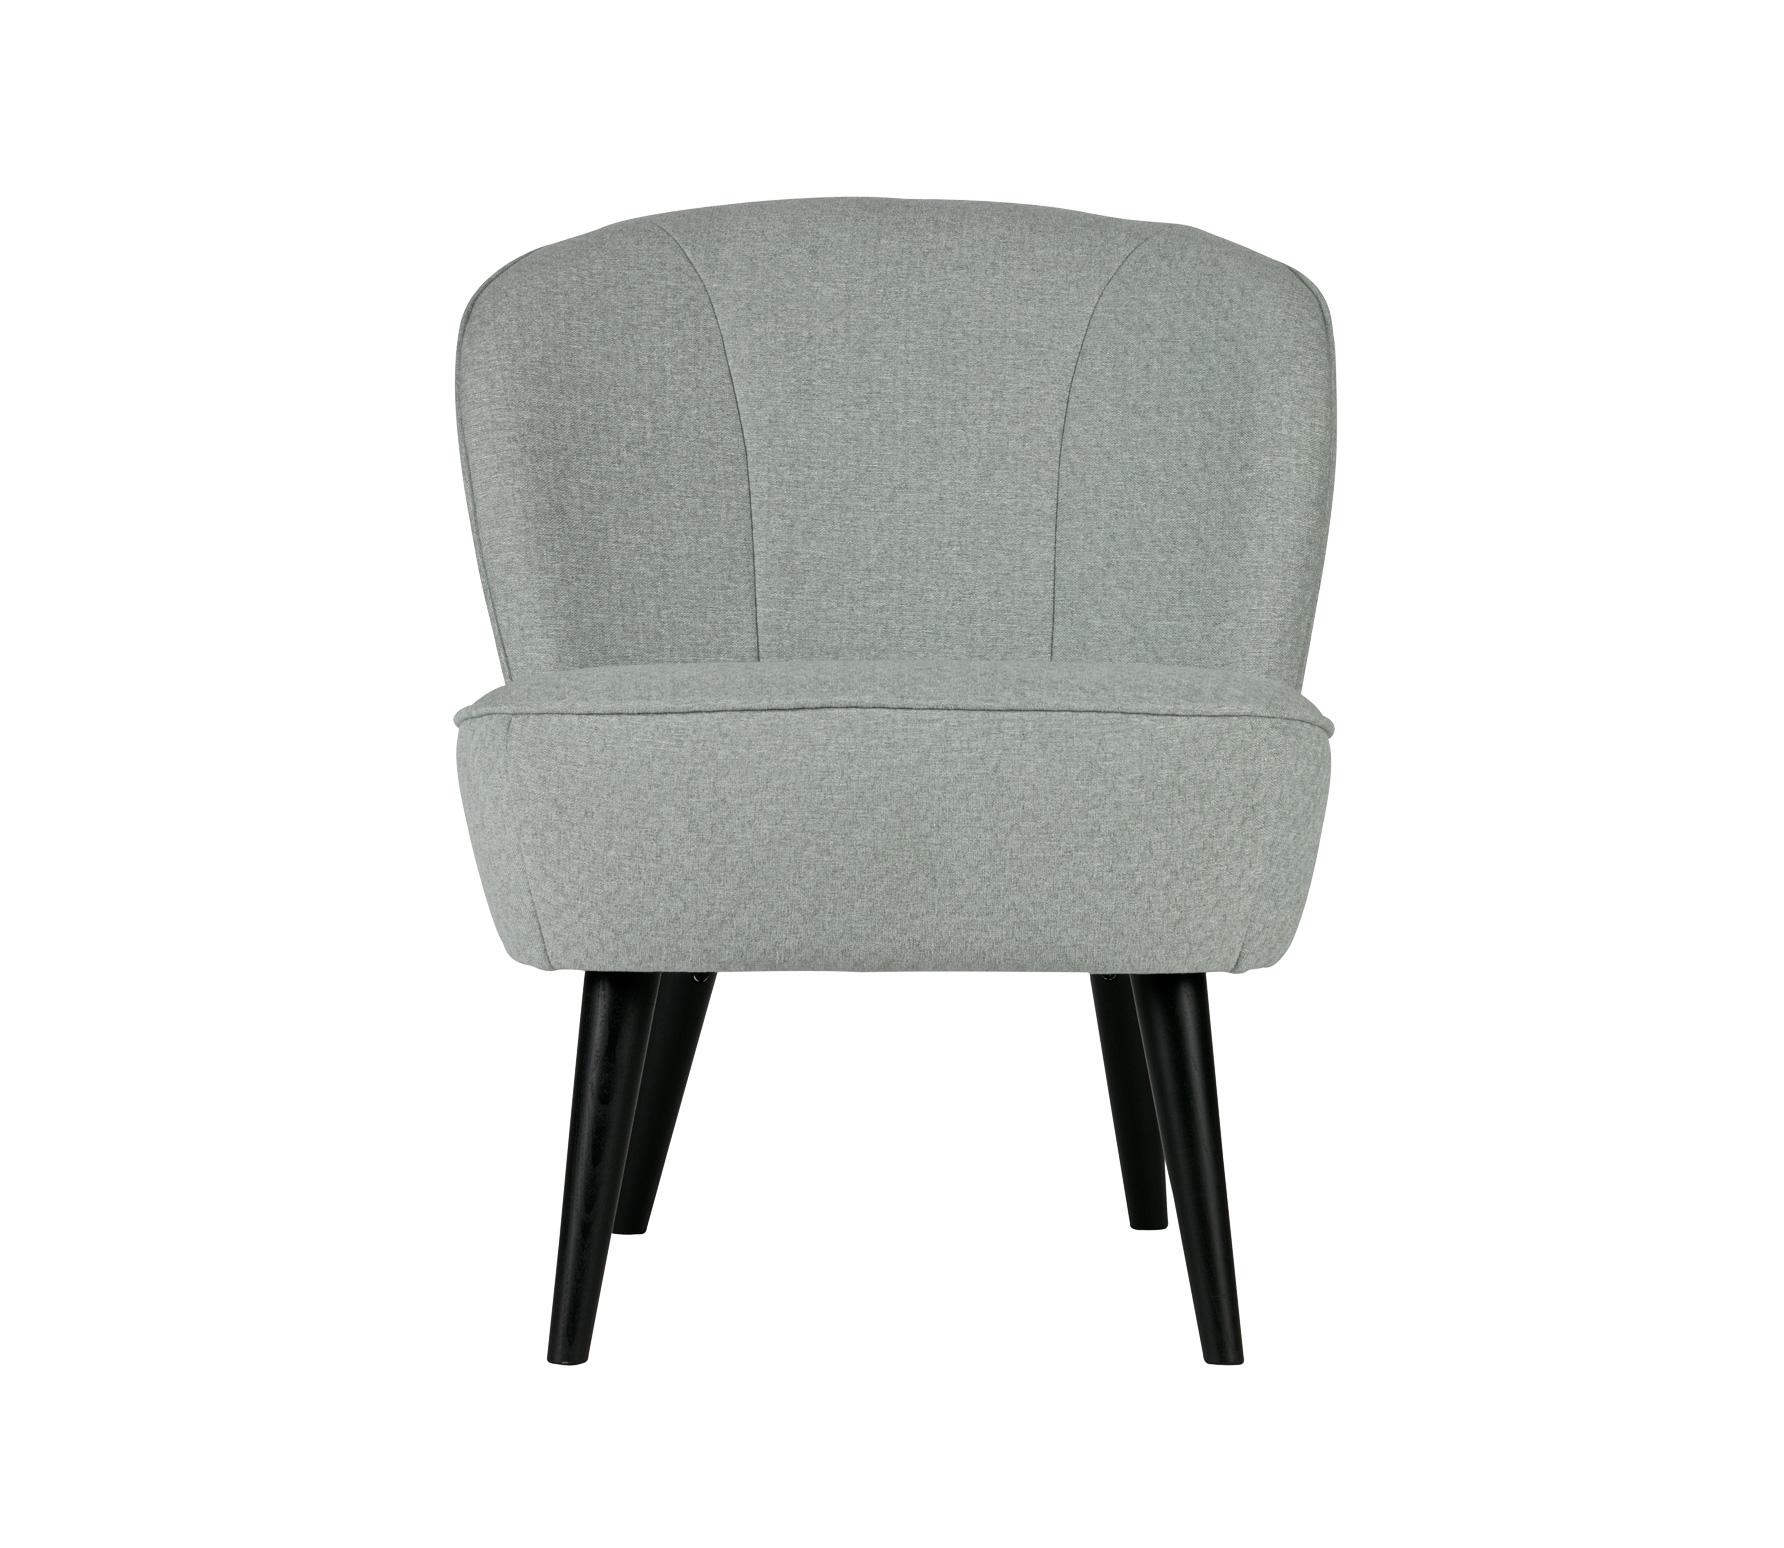 Basiclabel Pyke fauteuil zeegroen Zeegroen